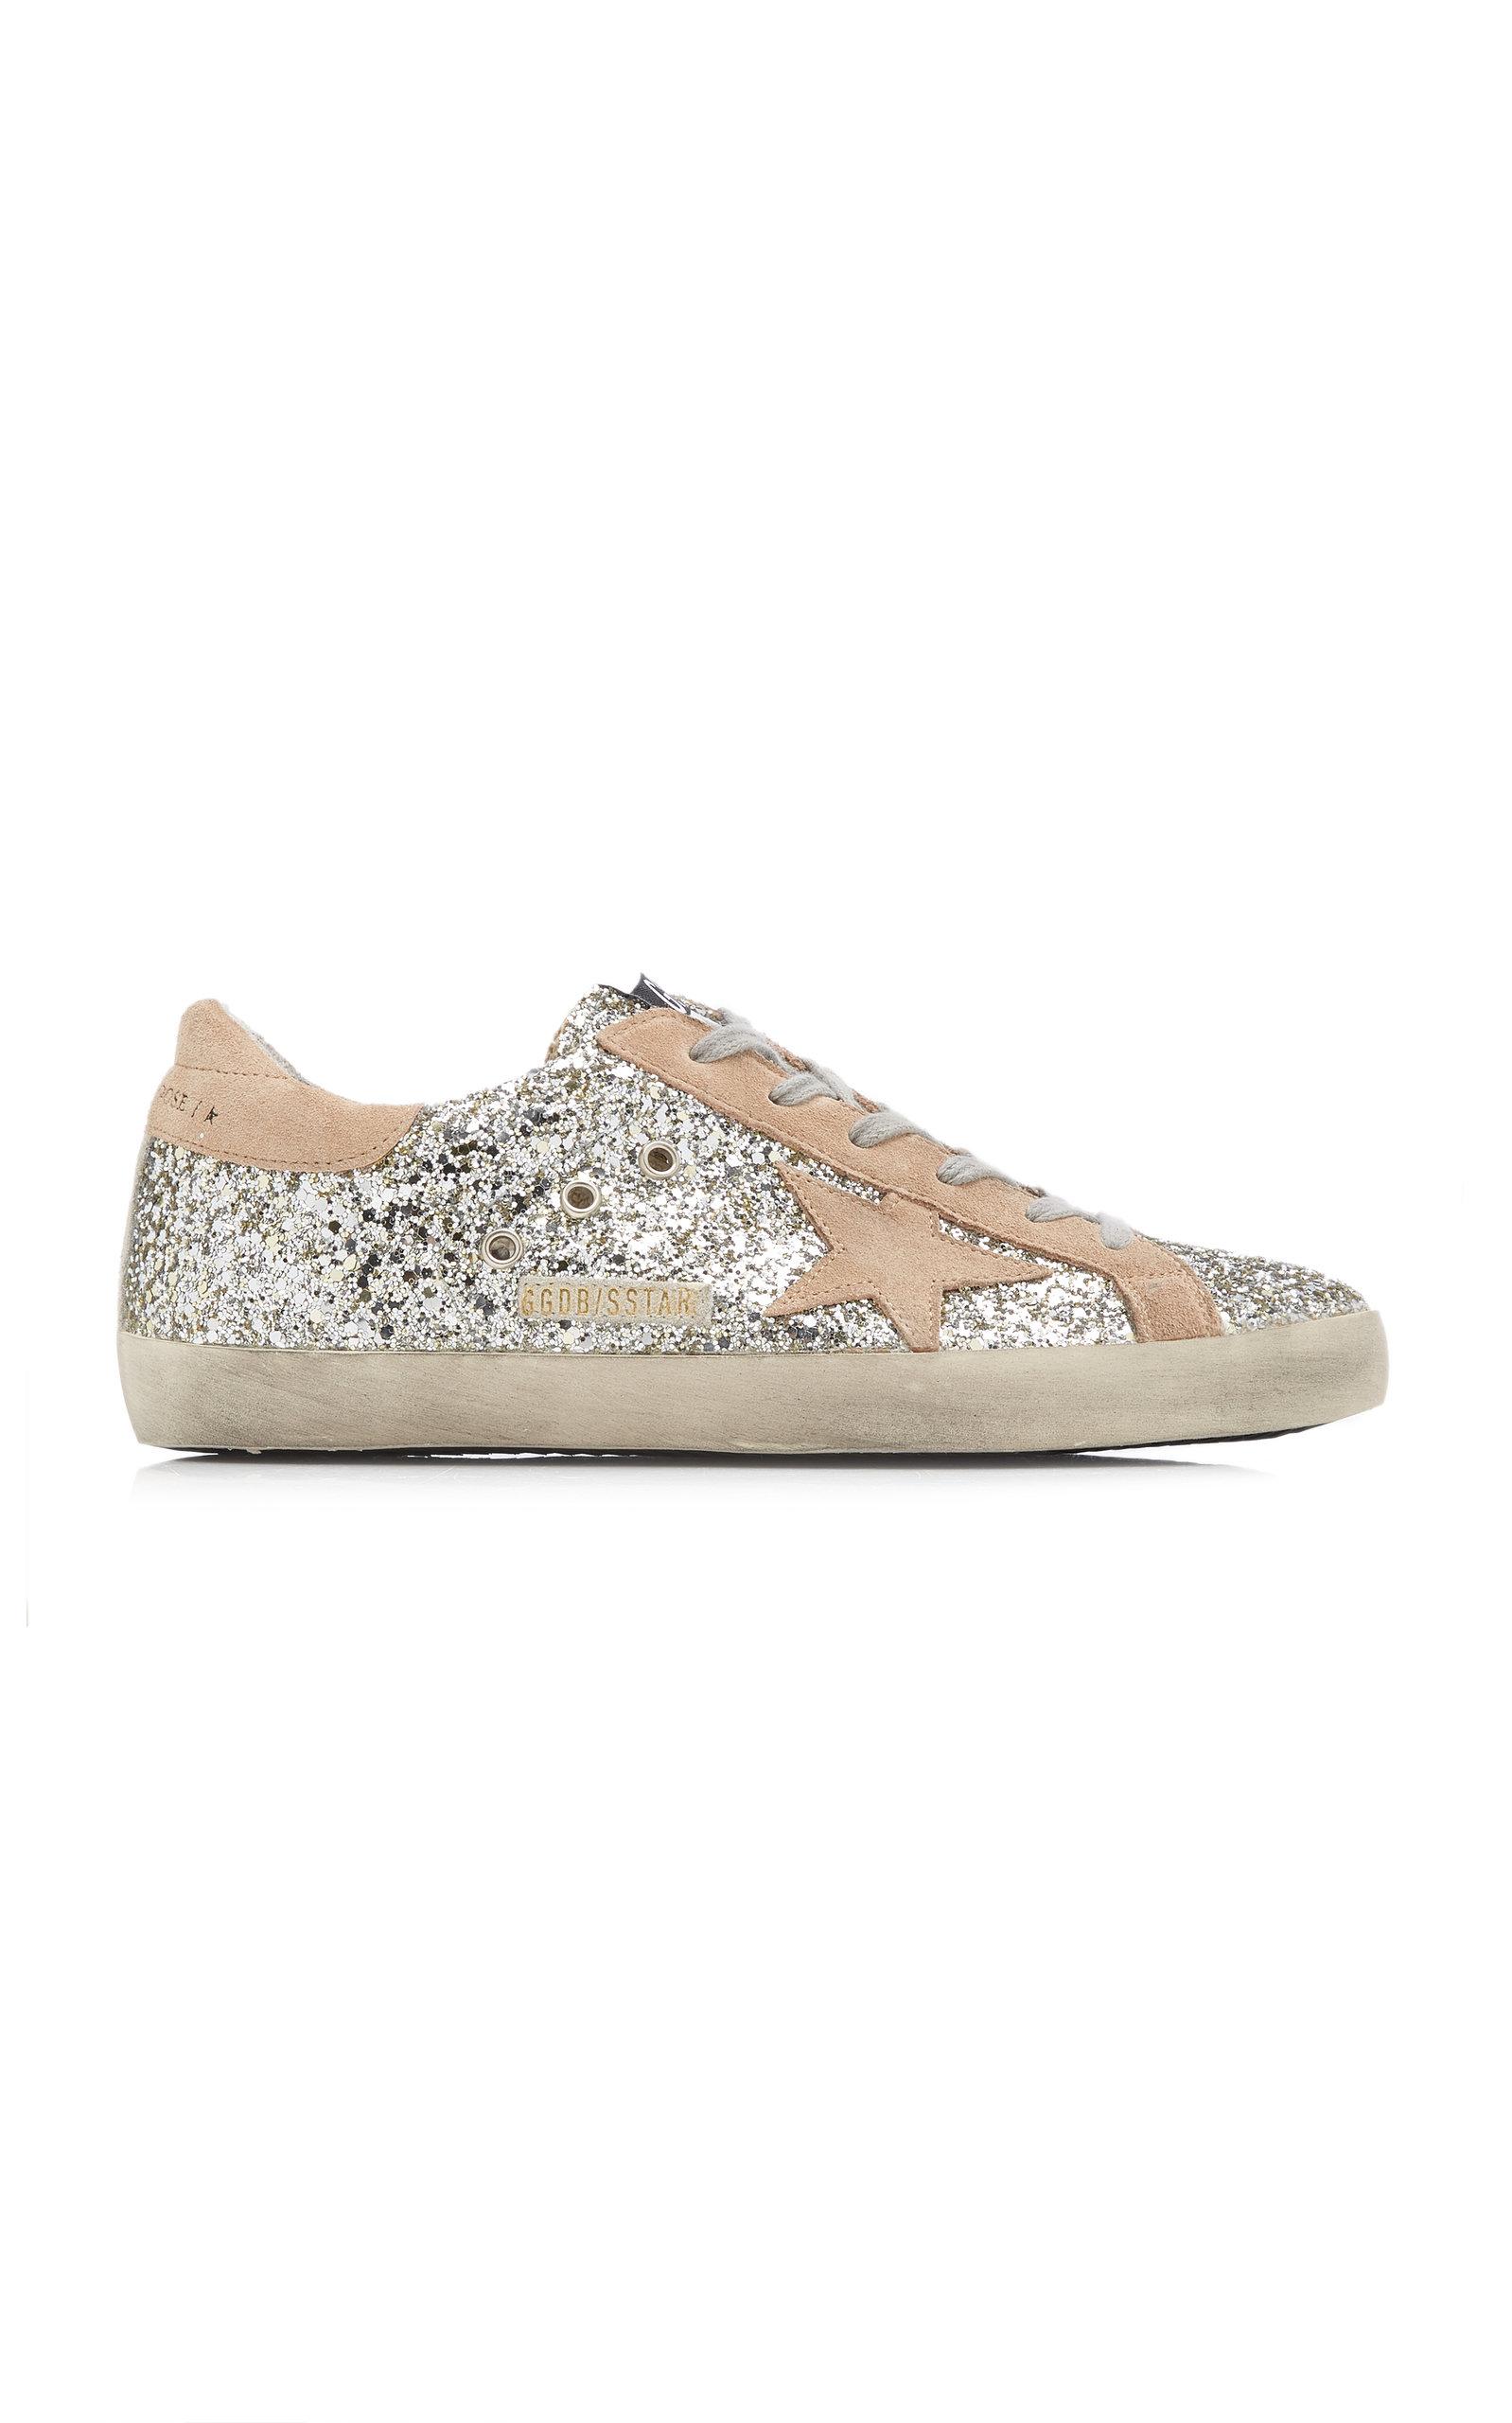 Golden Goose - Women's Superstar Glittered Leather Sneakers - Silver - Moda Operandi